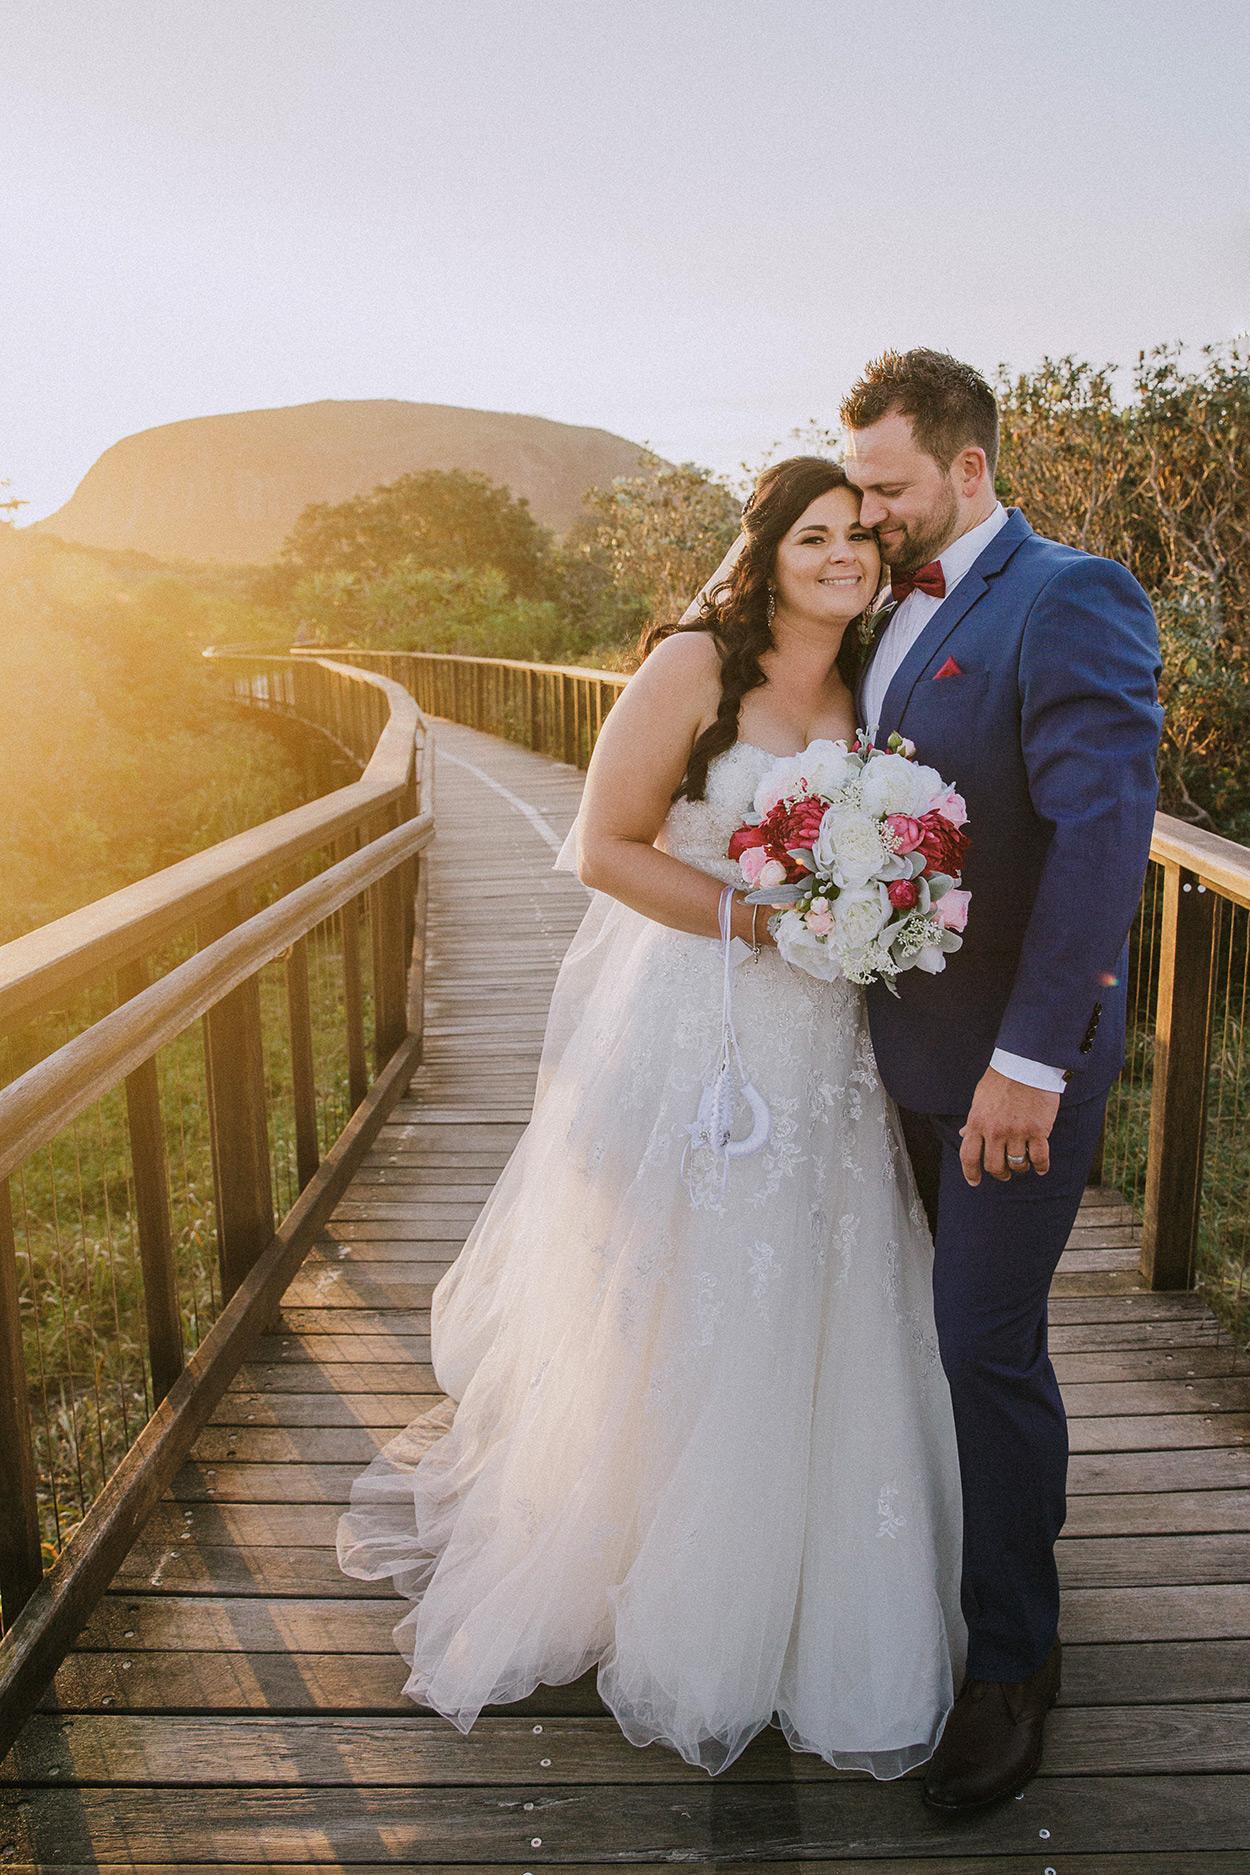 Candid Surfair, Marcoola Bridal Portraits, Sunshine Coast - Mount Coolum, Queensland, Australian Destination Photographer